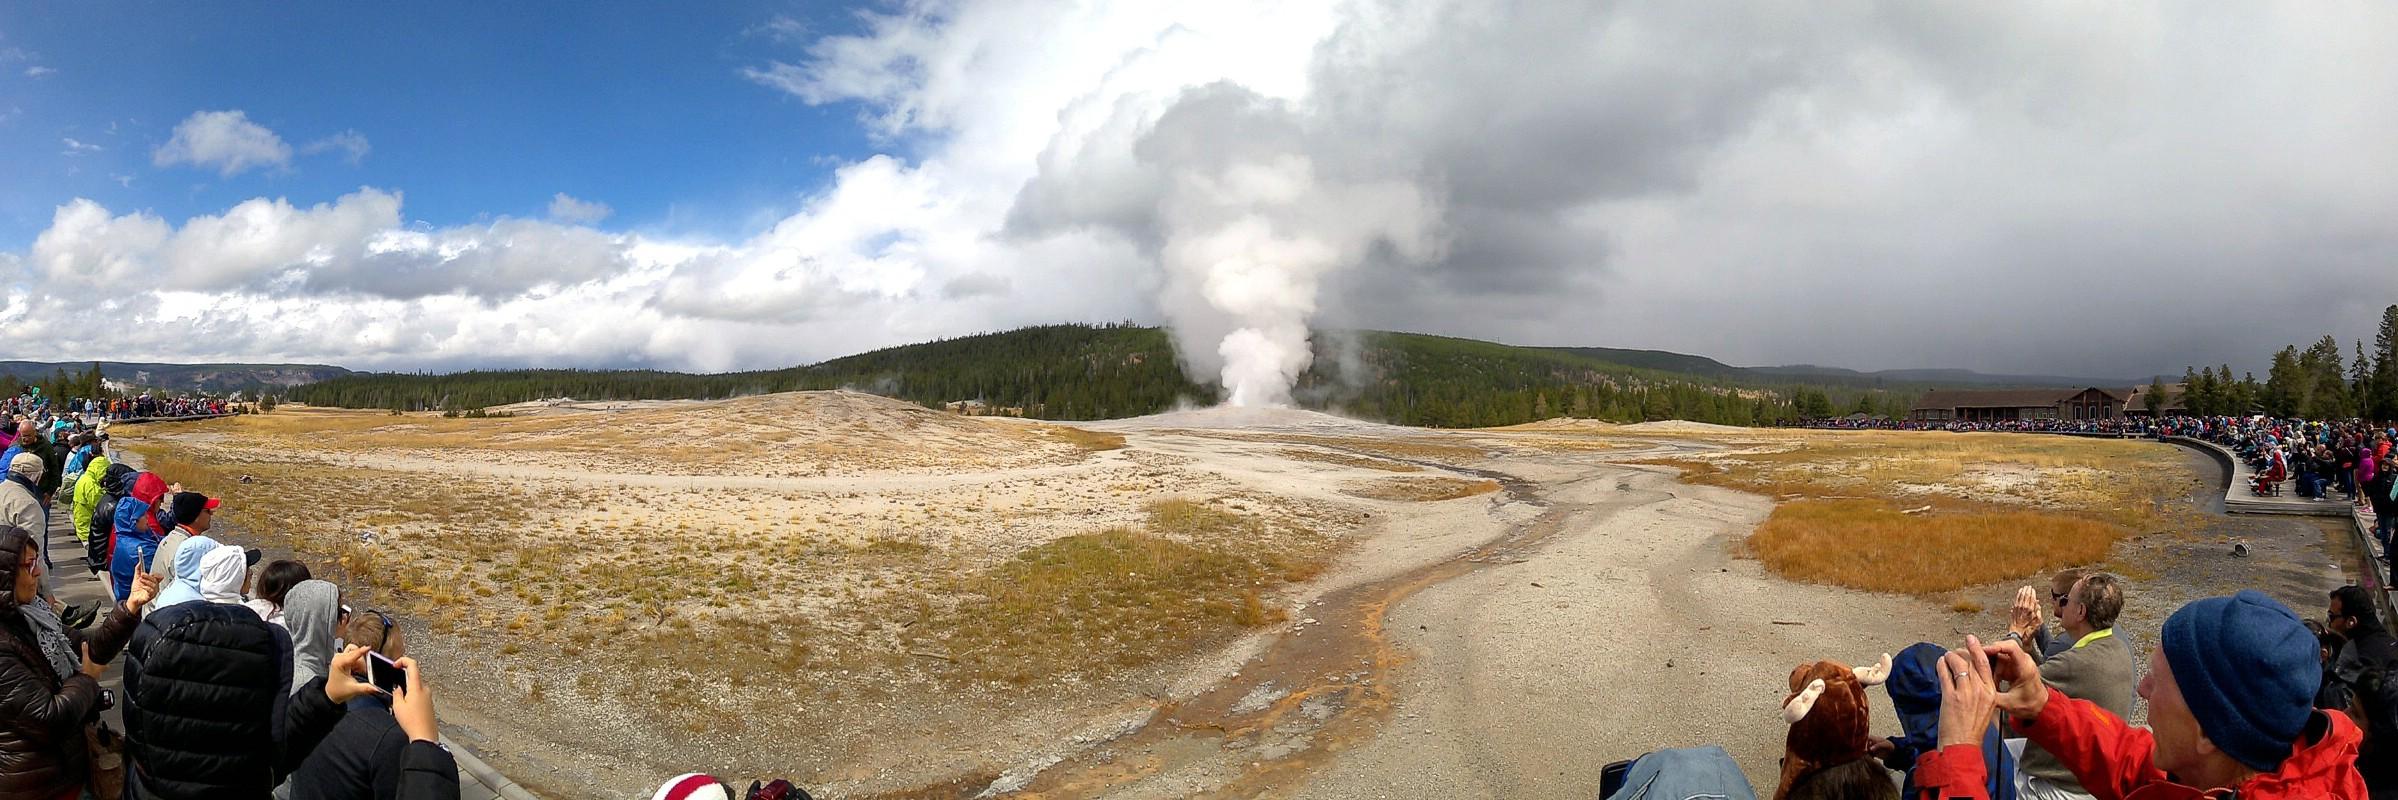 Old Faithful, Upper Geyser Basin, Yellowstone National Park, Wyoming, USA. September 5, 2016.